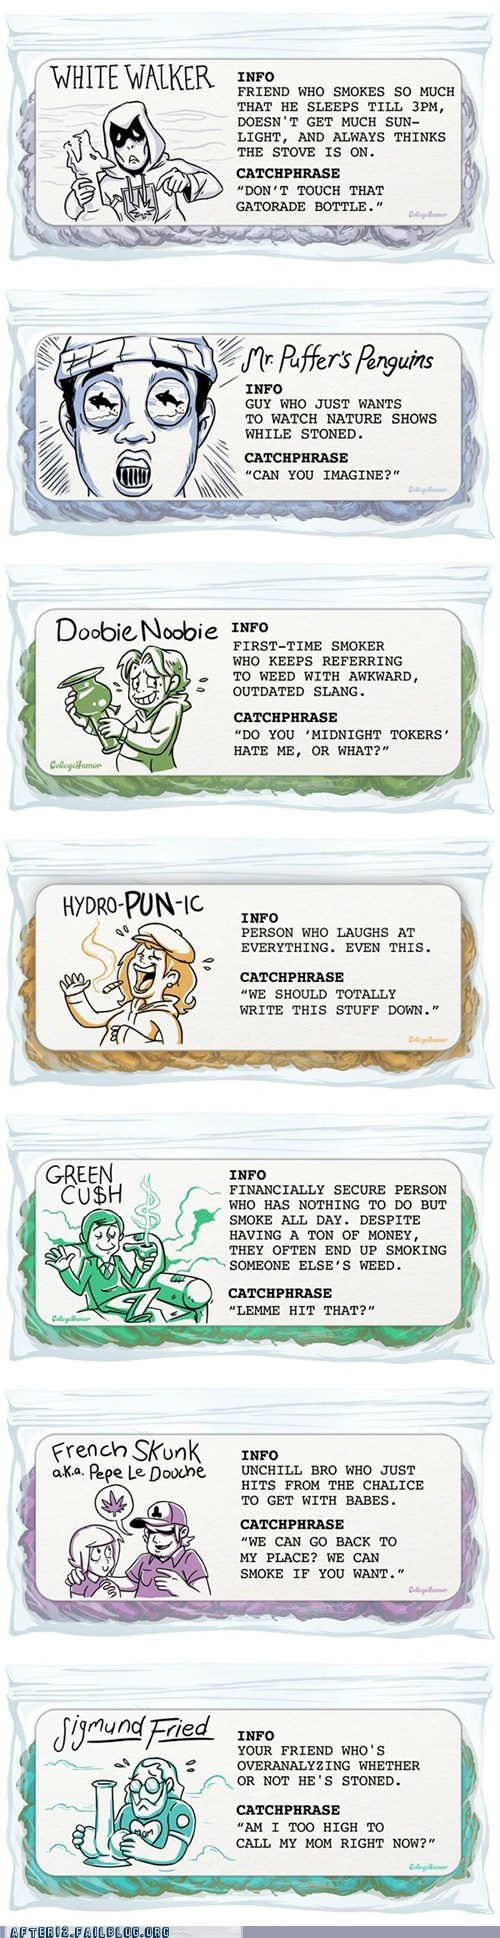 420 after 12 college humor doobie noobie french skunk green cush hydropunic marijuana mr-puffers-penguins pot sigmund fried smoke weed white walker - 6138029568